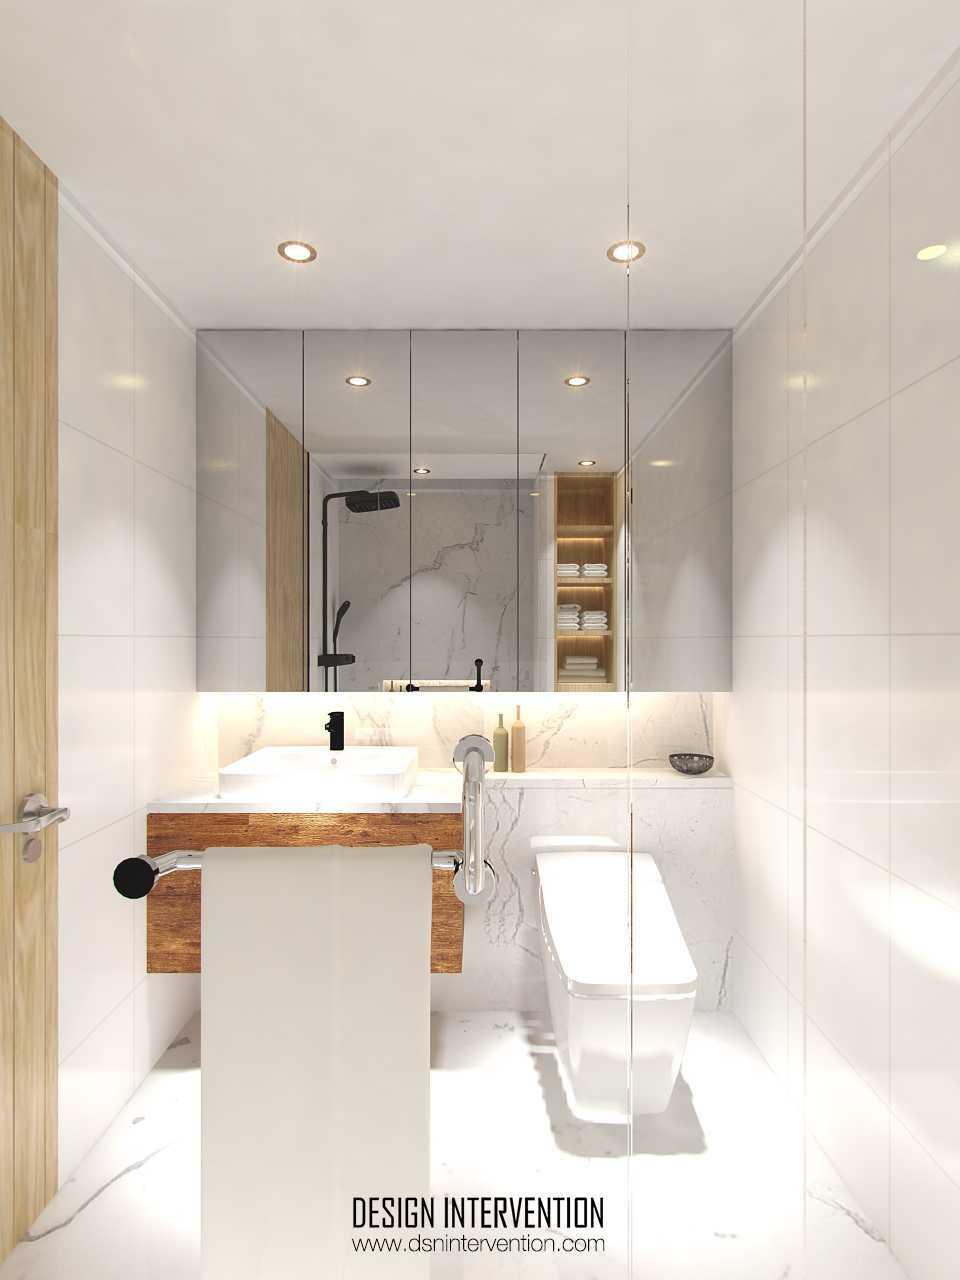 Design Intervention Pk Apartment Puri Kasablanka Apartment Puri Kasablanka Apartment Door-Design-View Skandinavia  14977